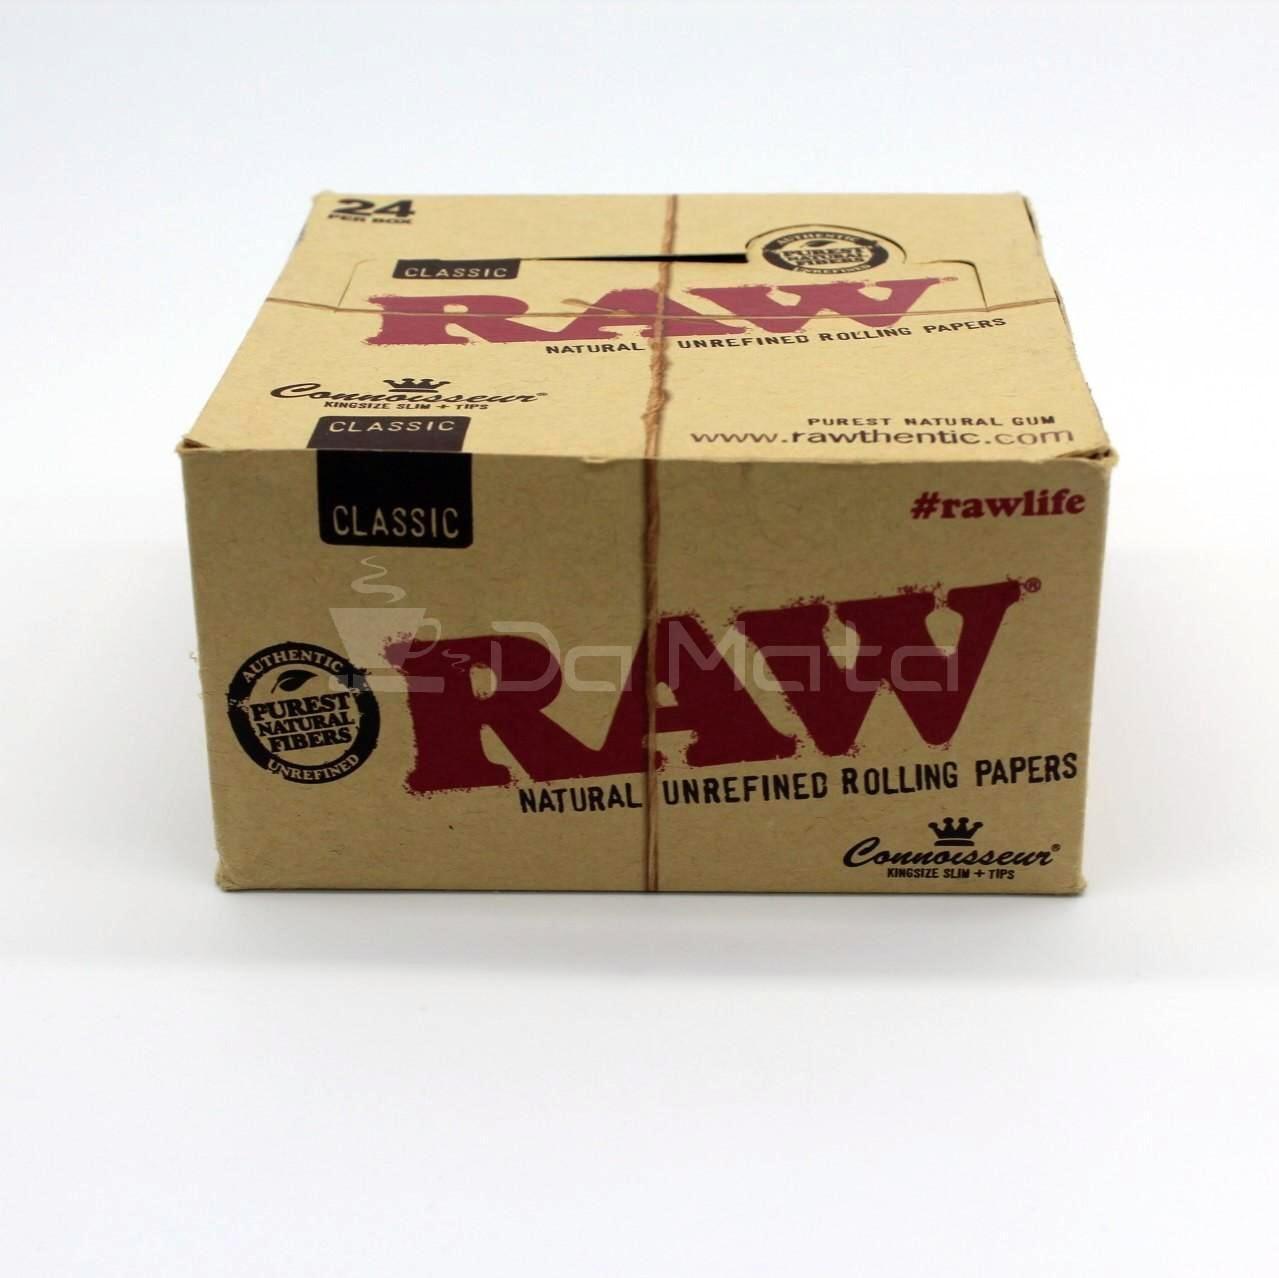 Seda Raw Classic com piteira - Connoisseur